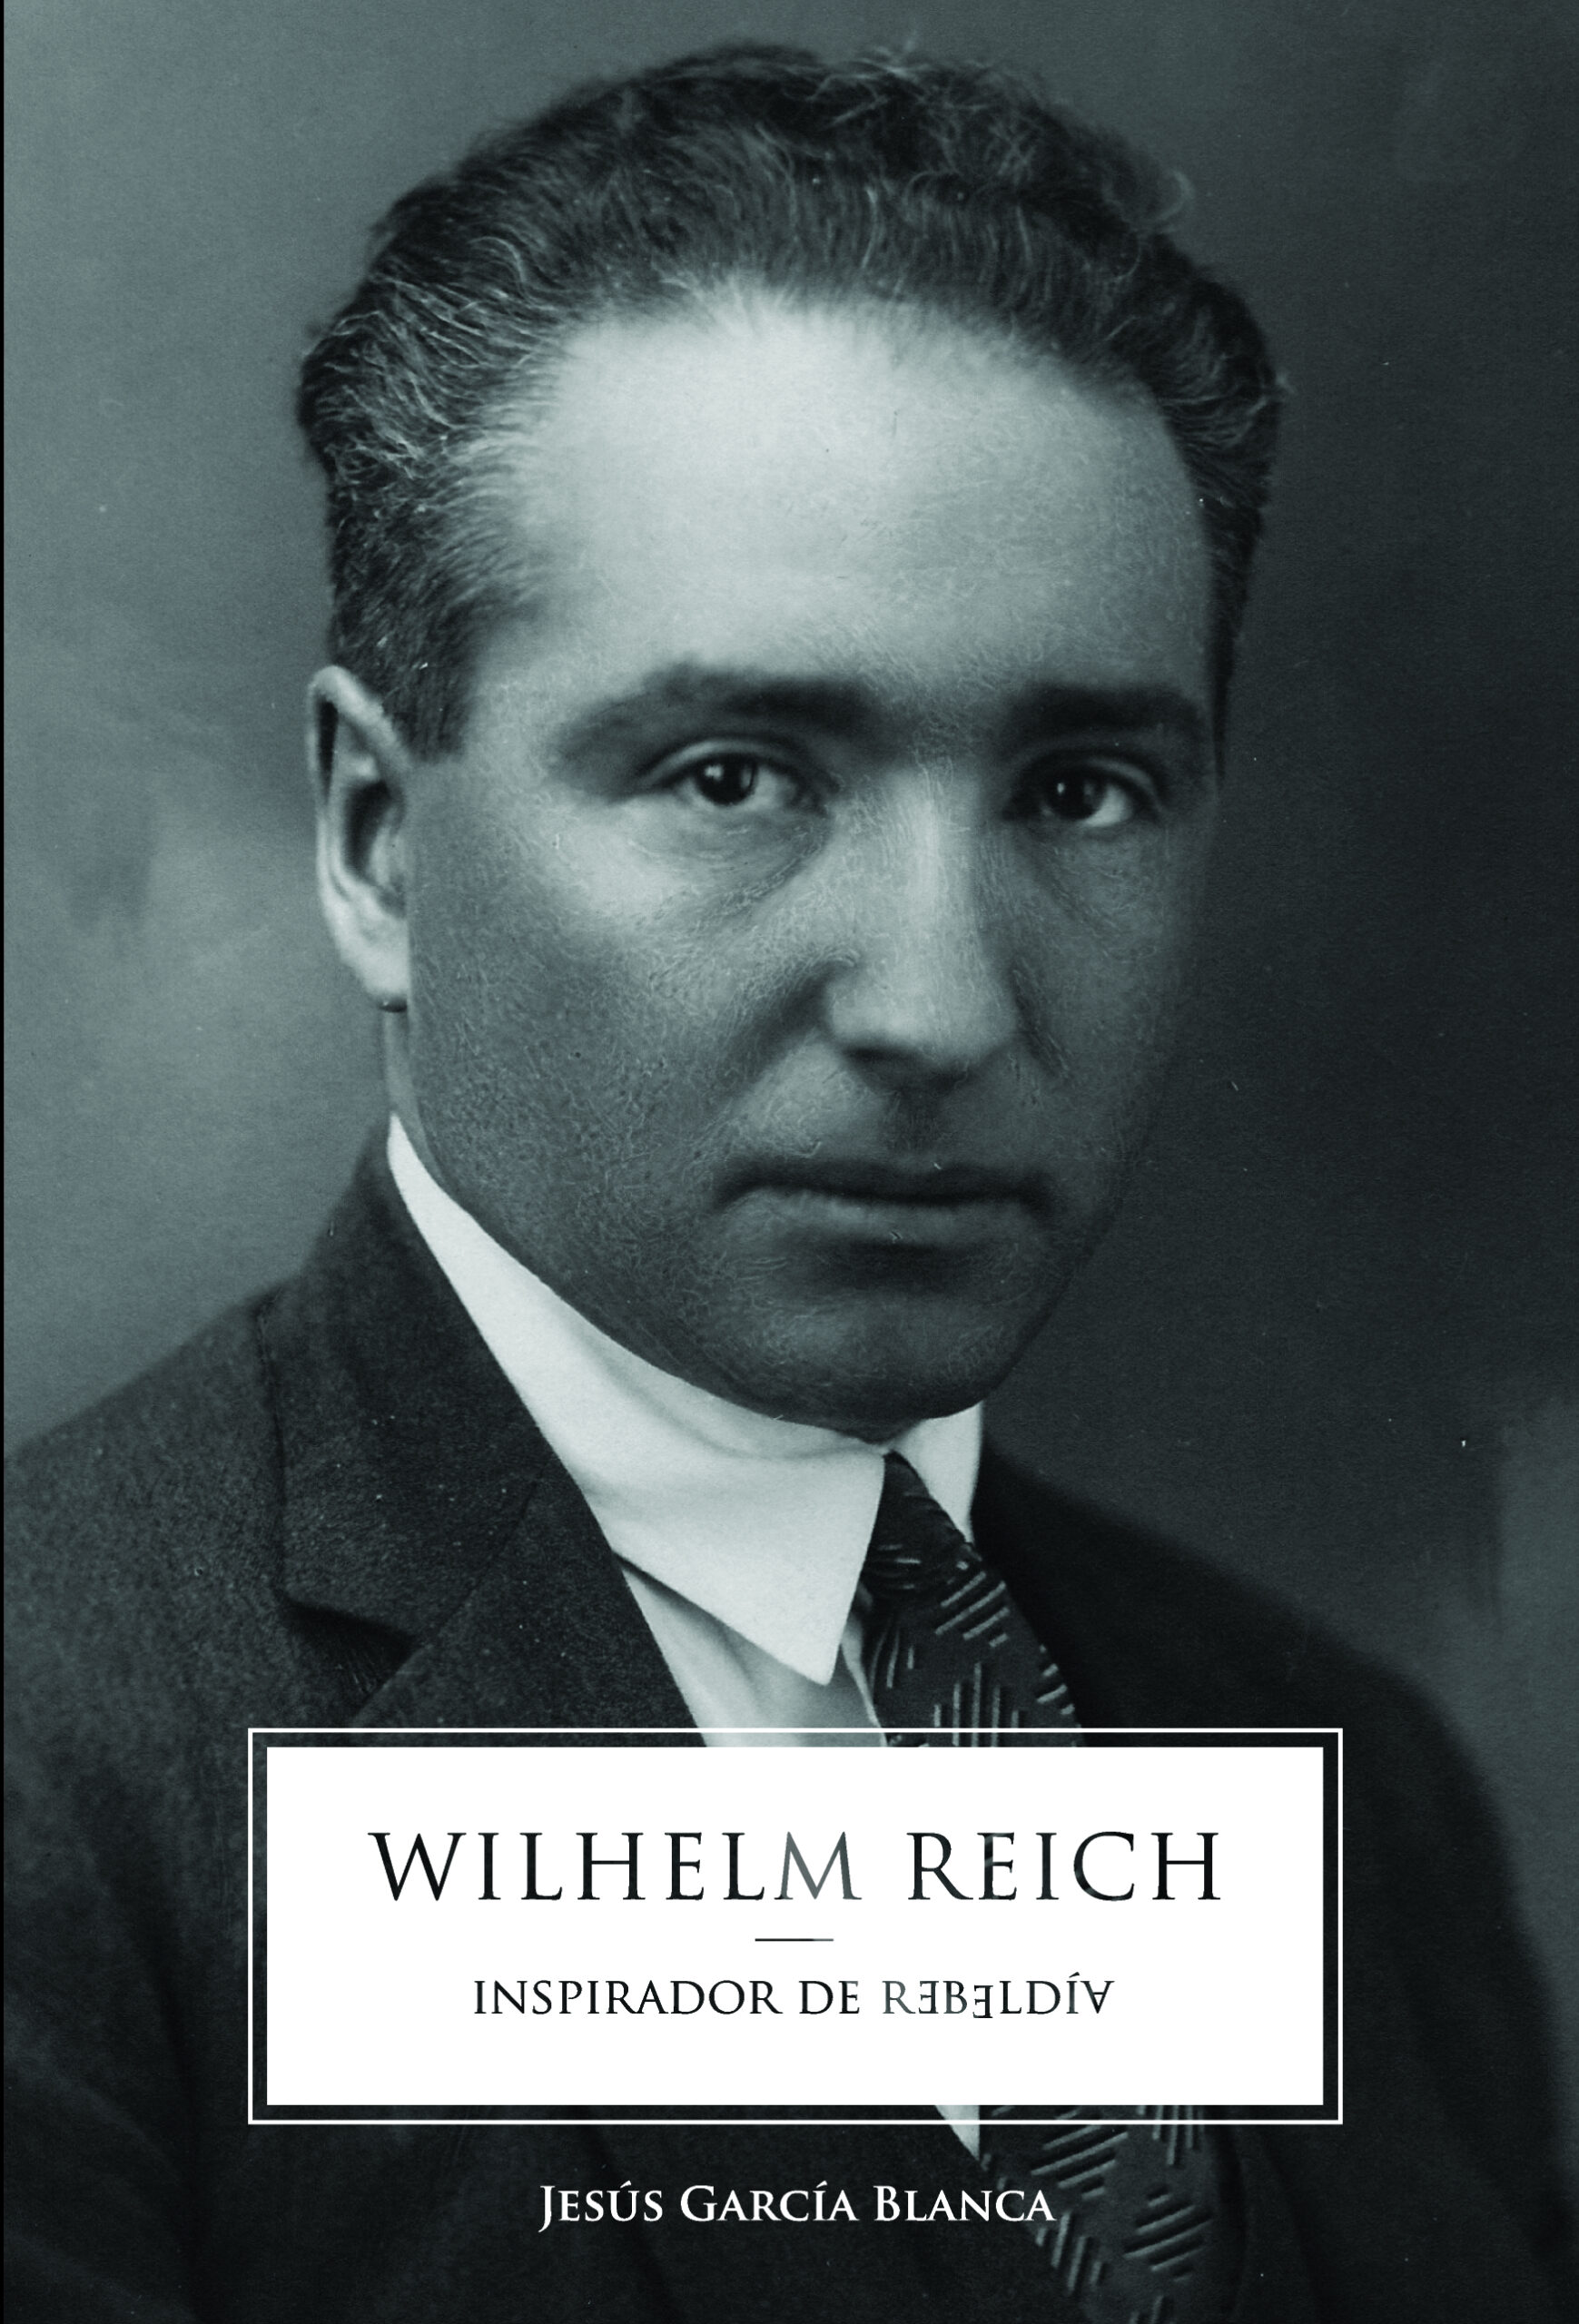 Portada libro Wilhem Reich